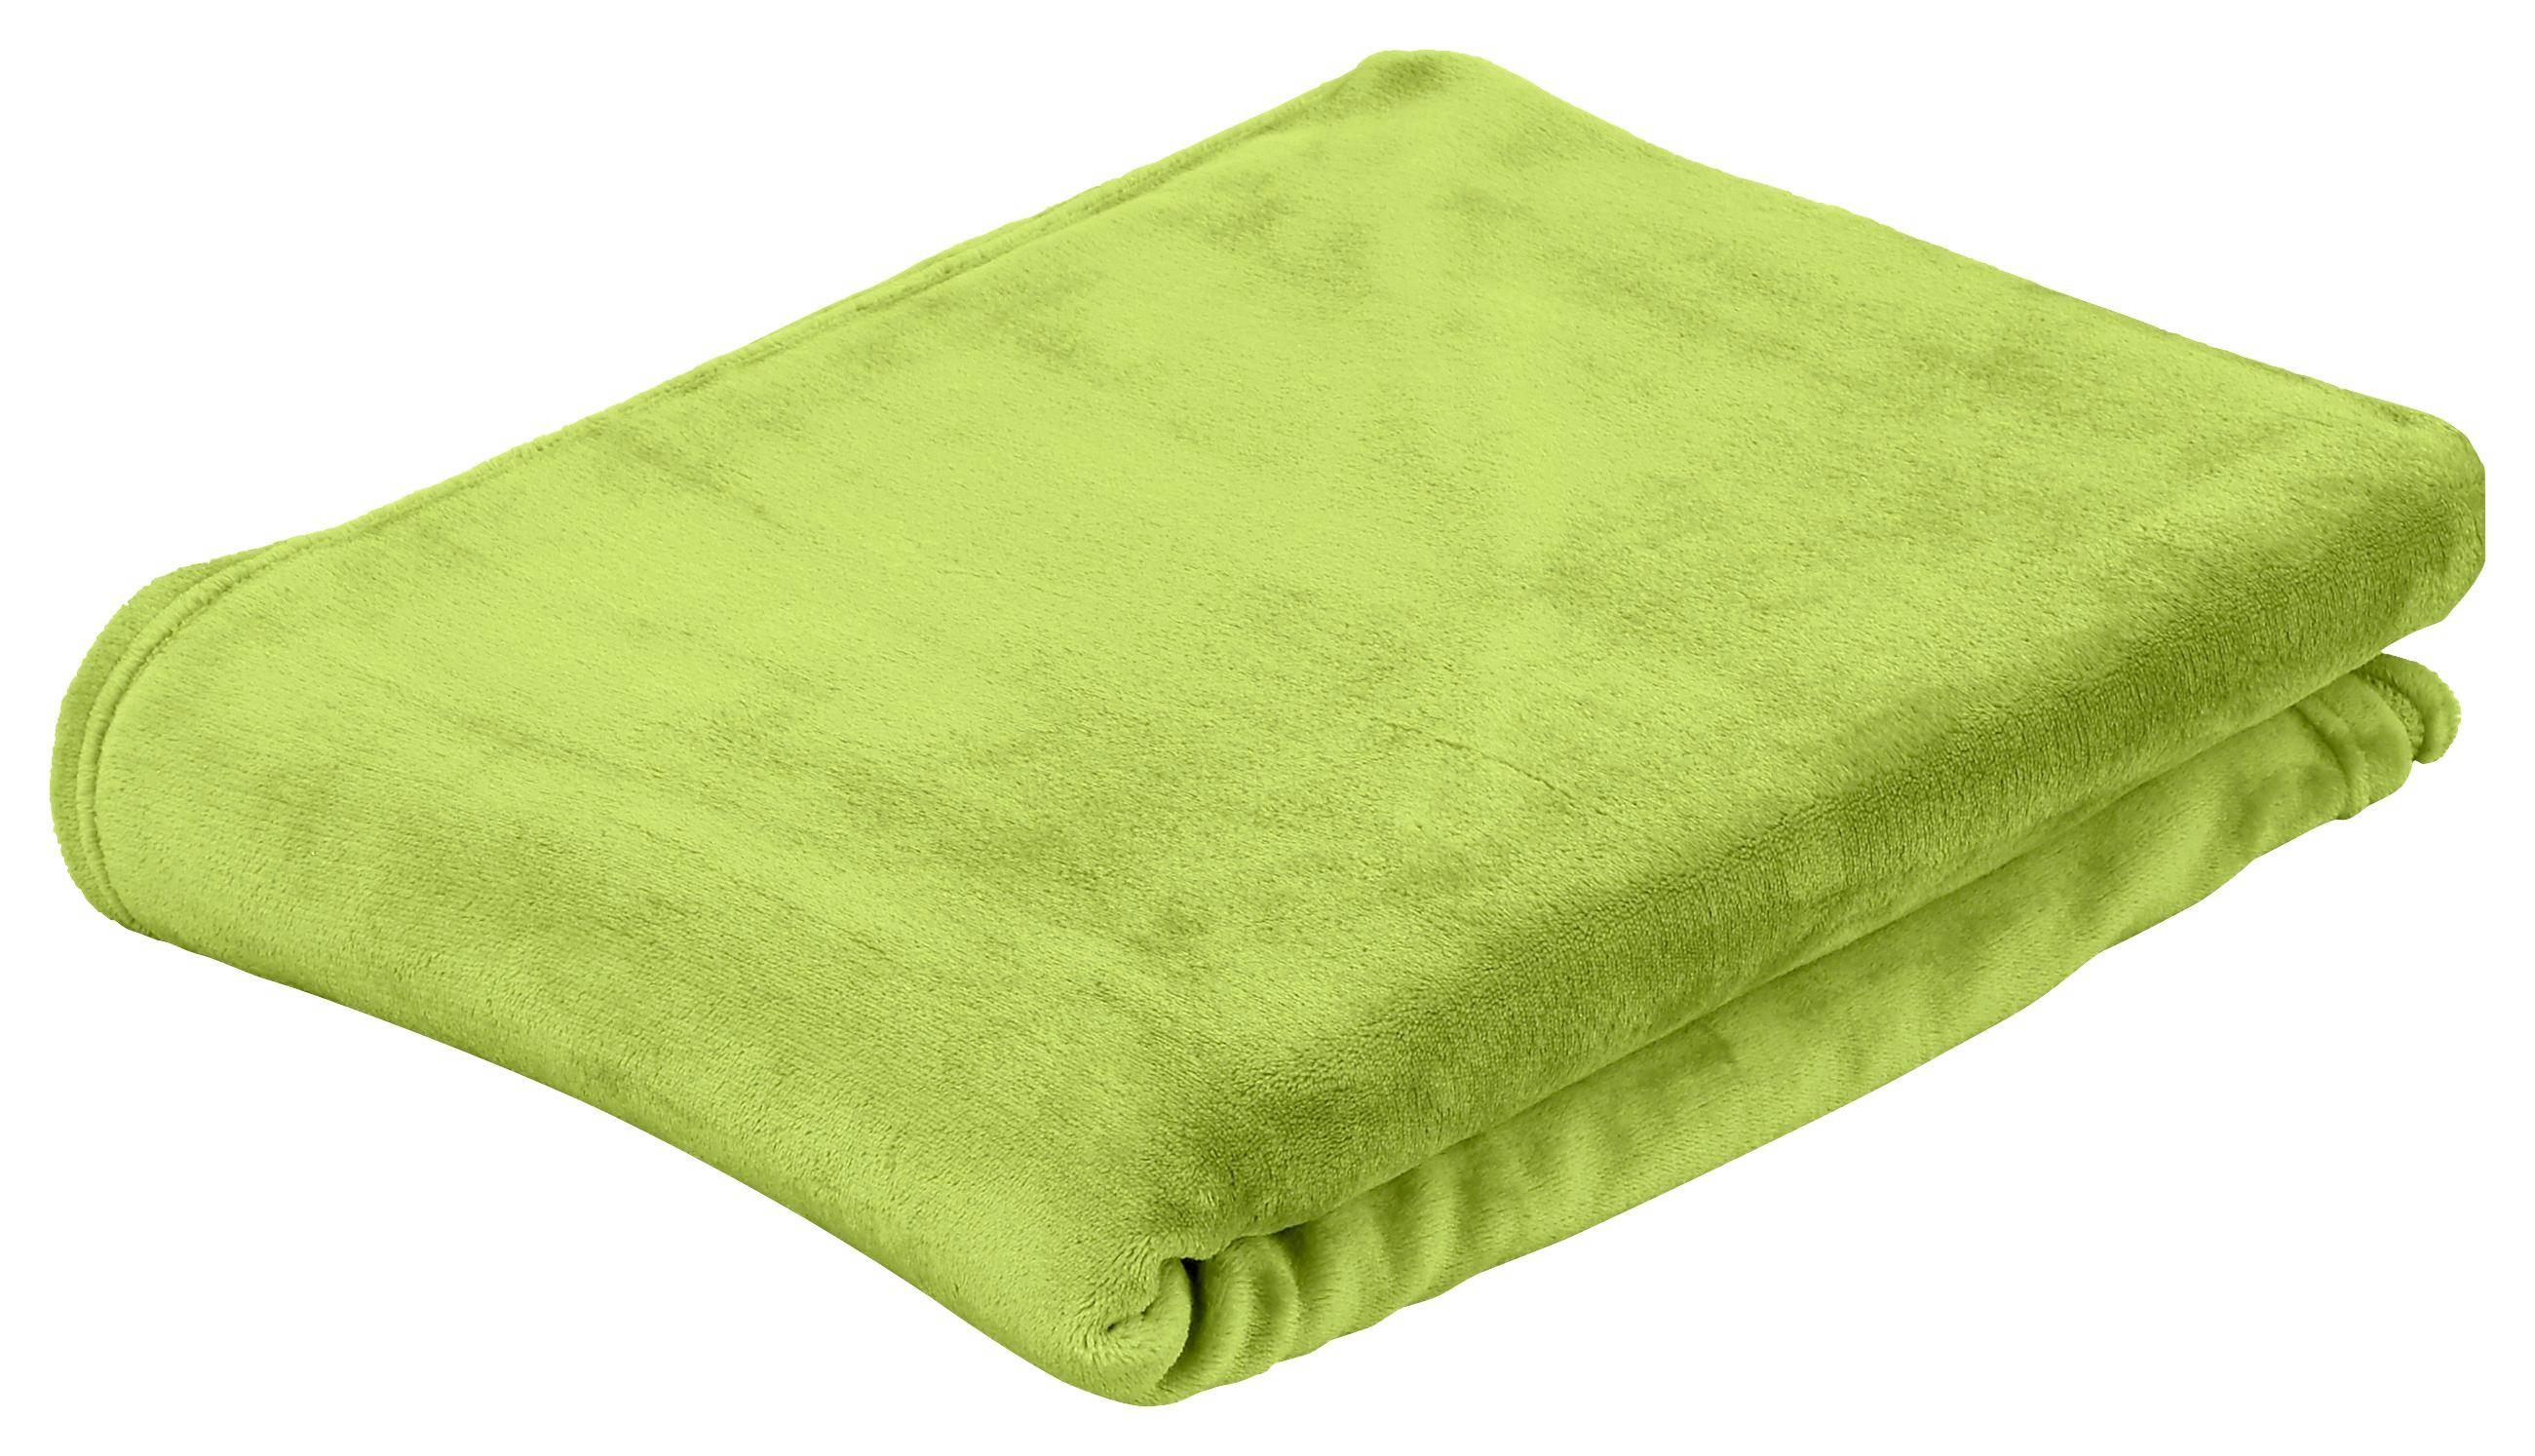 Puha Takaró Marlies I - zöld, konvencionális, textil (220/240cm) - LUCA BESSONI